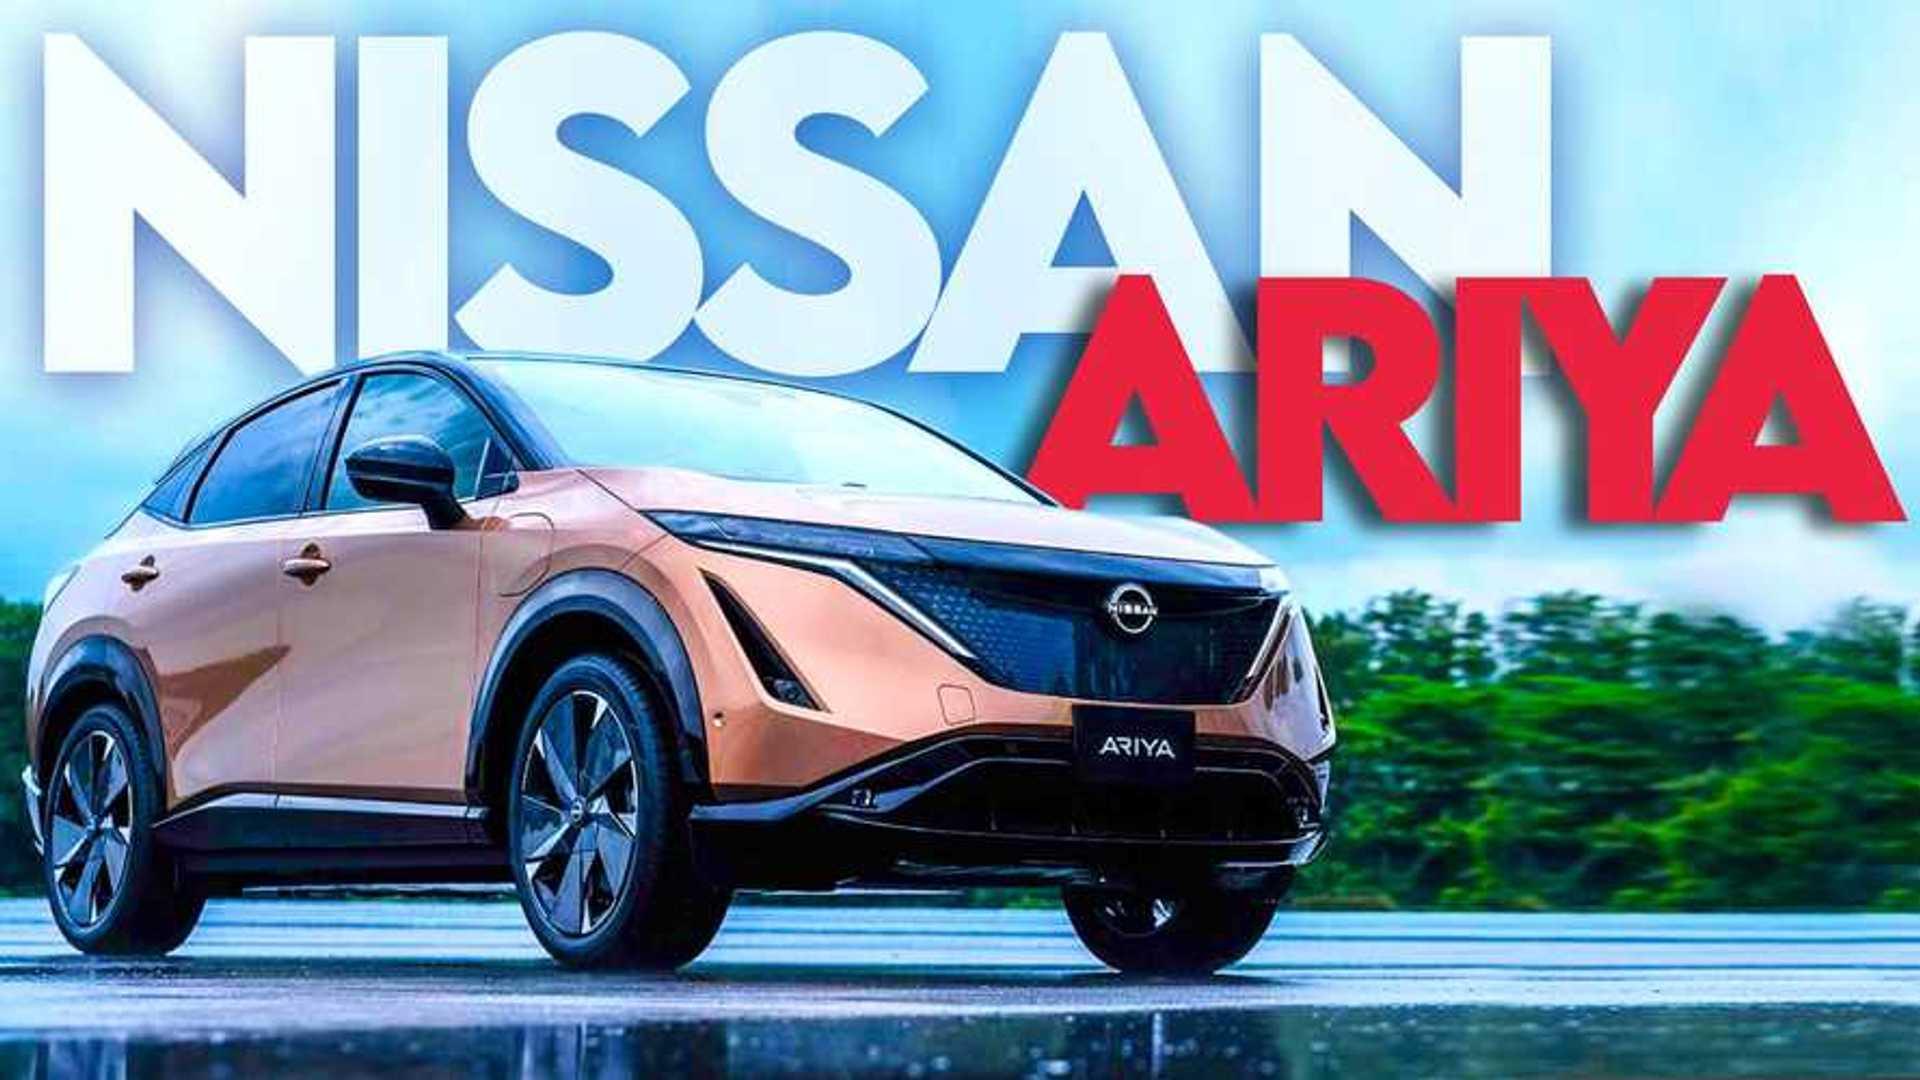 Nissan Ariya: Everything You Need To Know